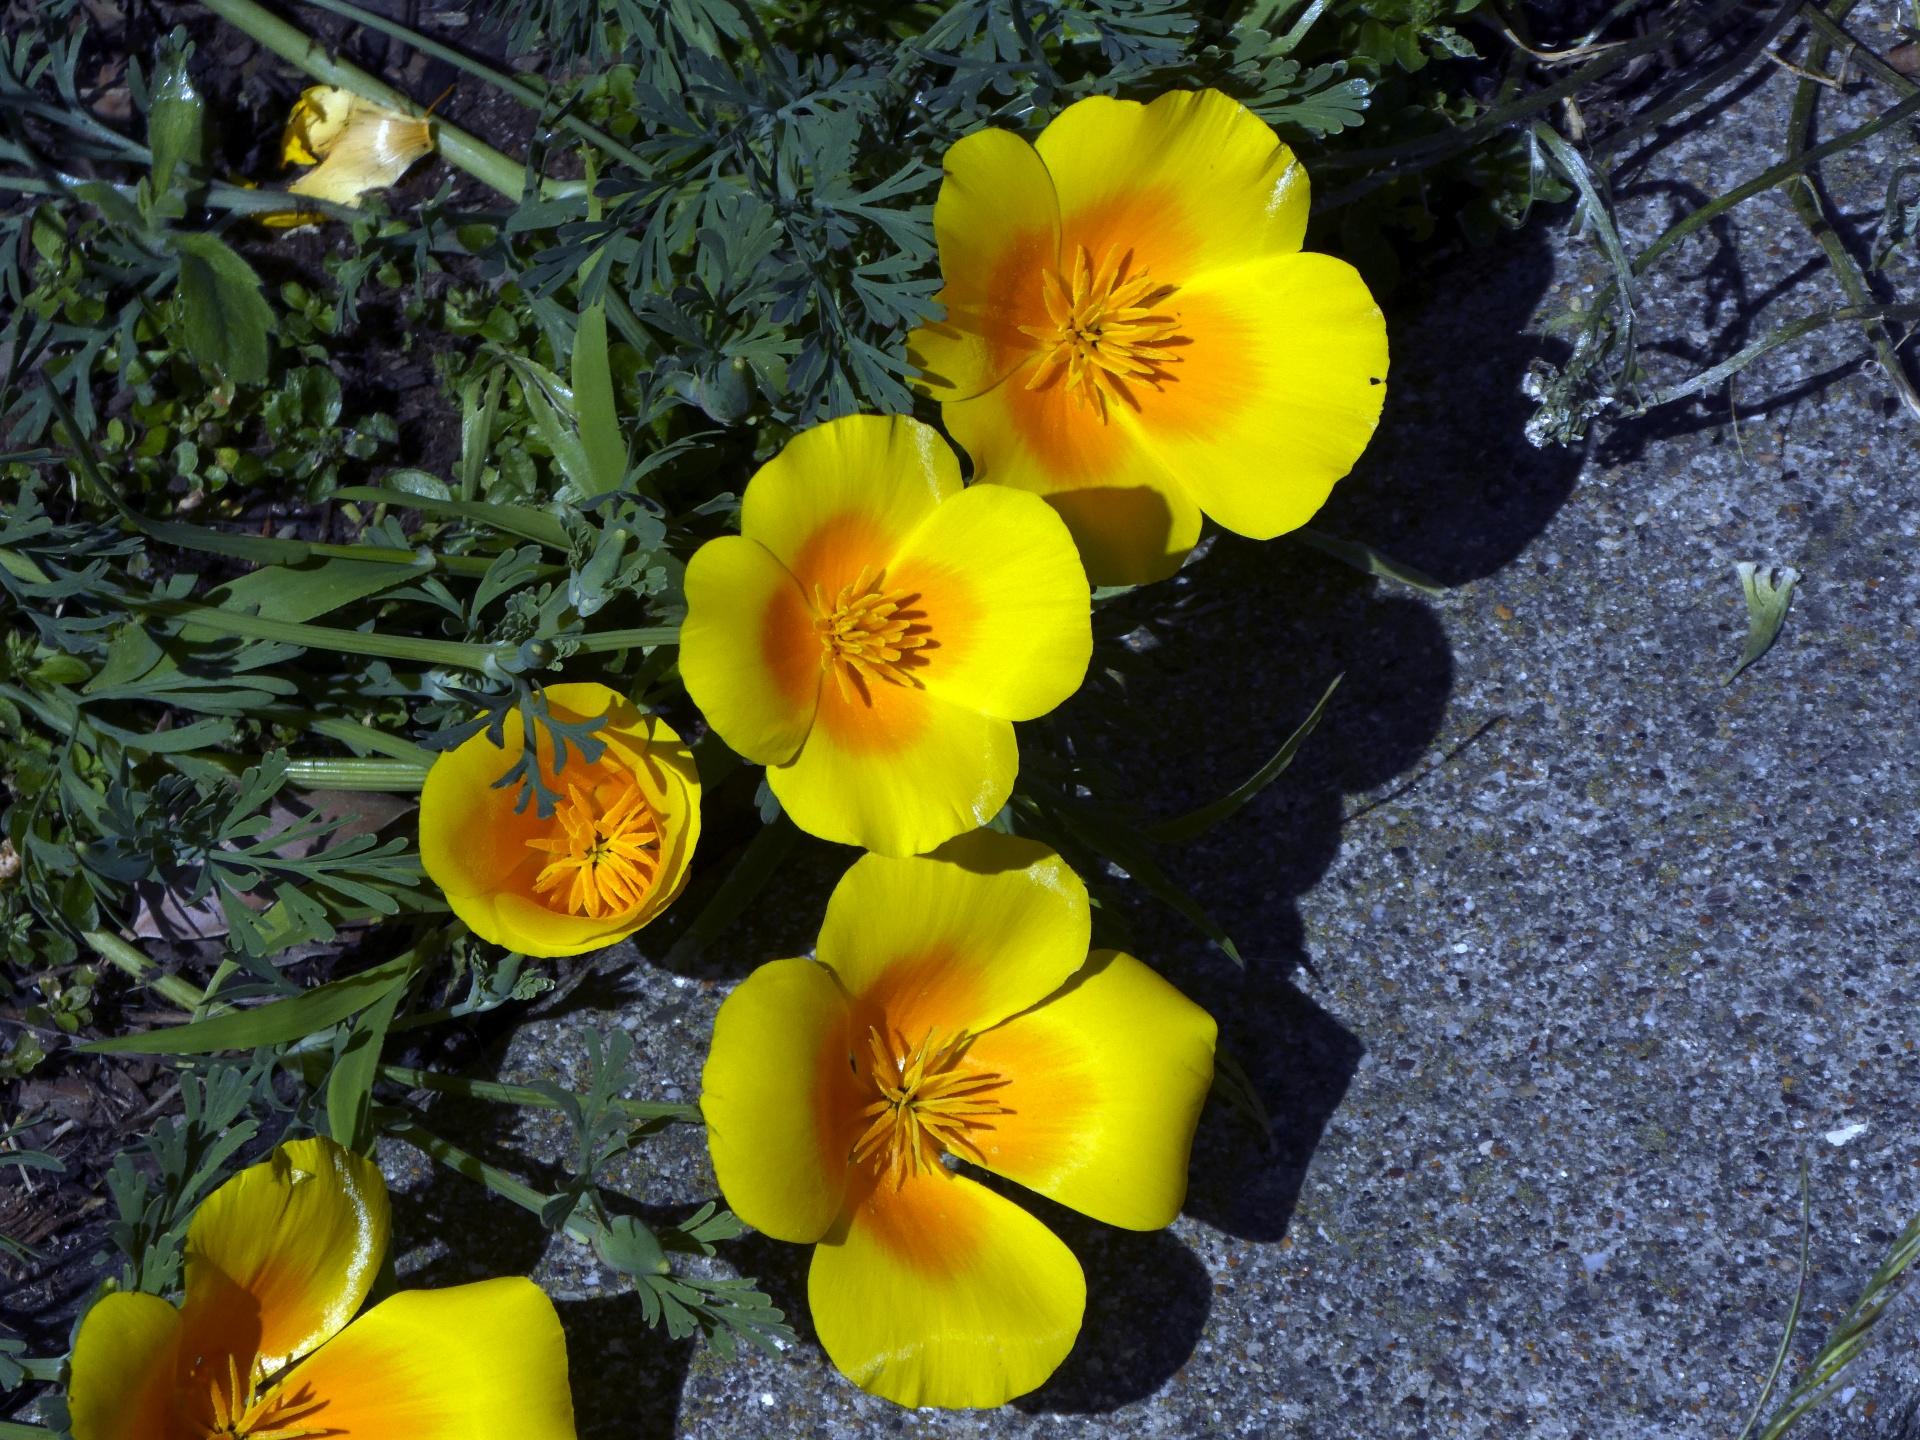 Flowerflowersfloralwildflowerspoppy Free Photo From Needpix